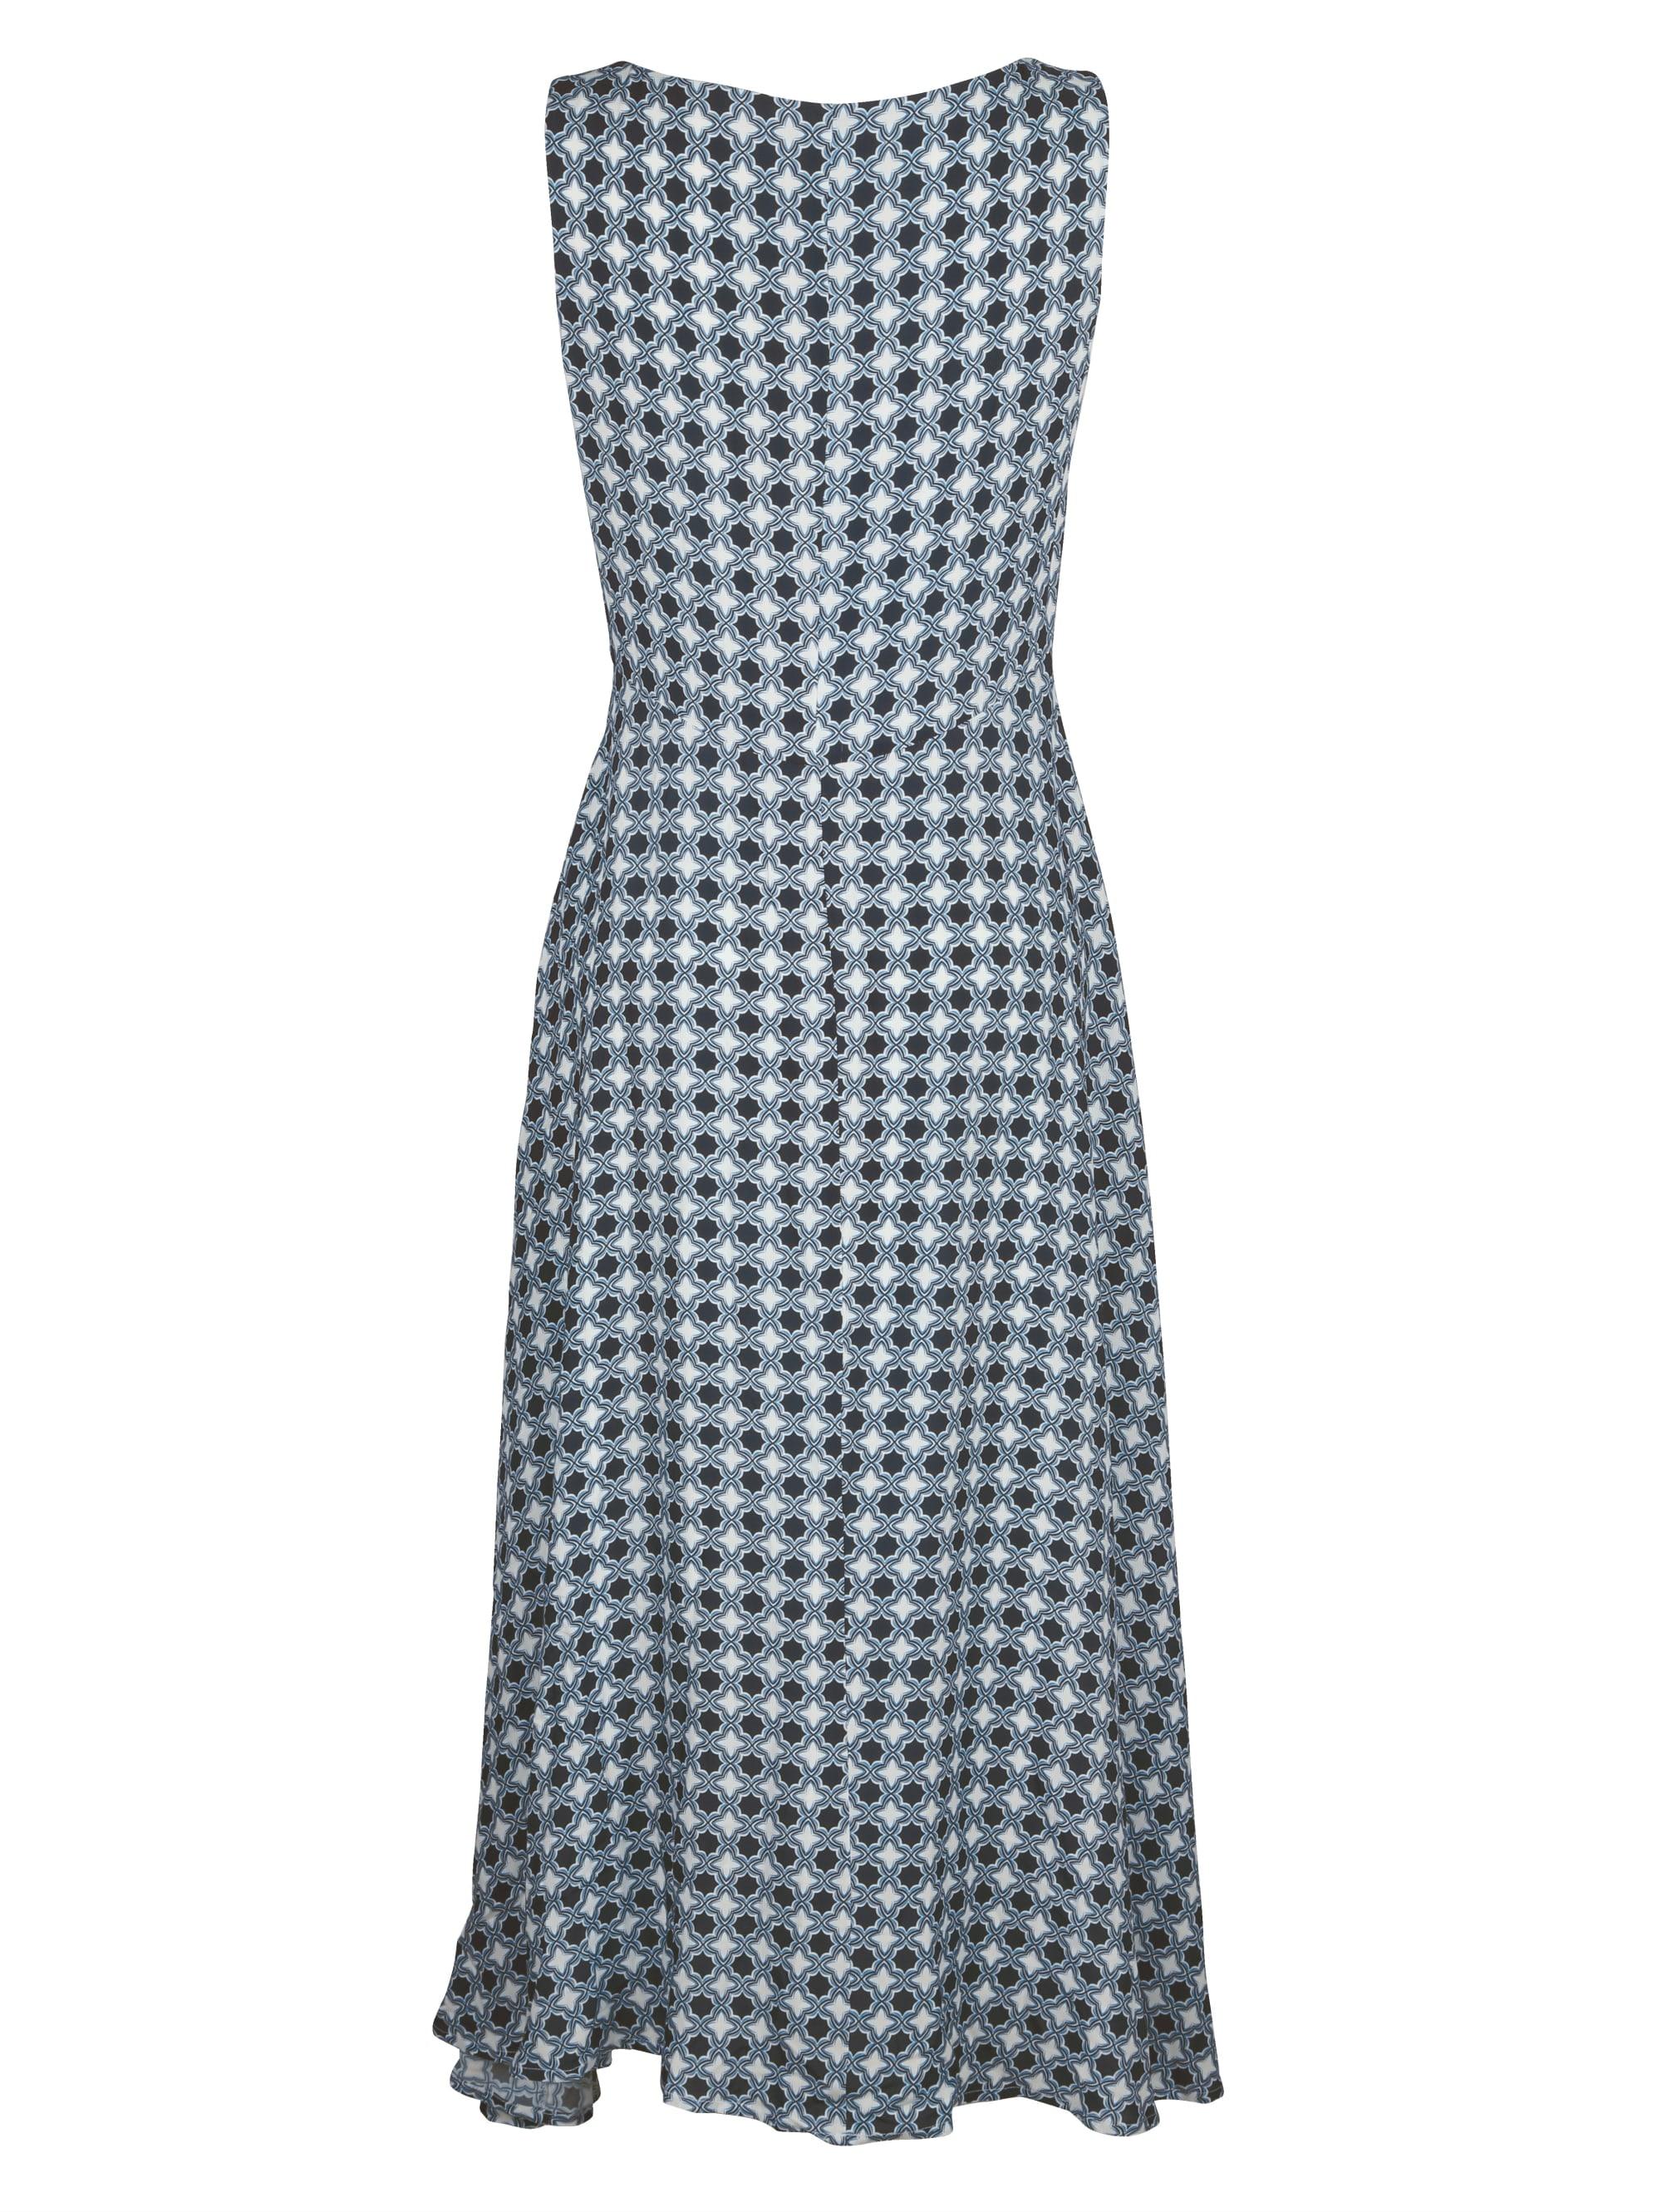 Alba Moda Kleid in figurumspielender Maxi-Länge